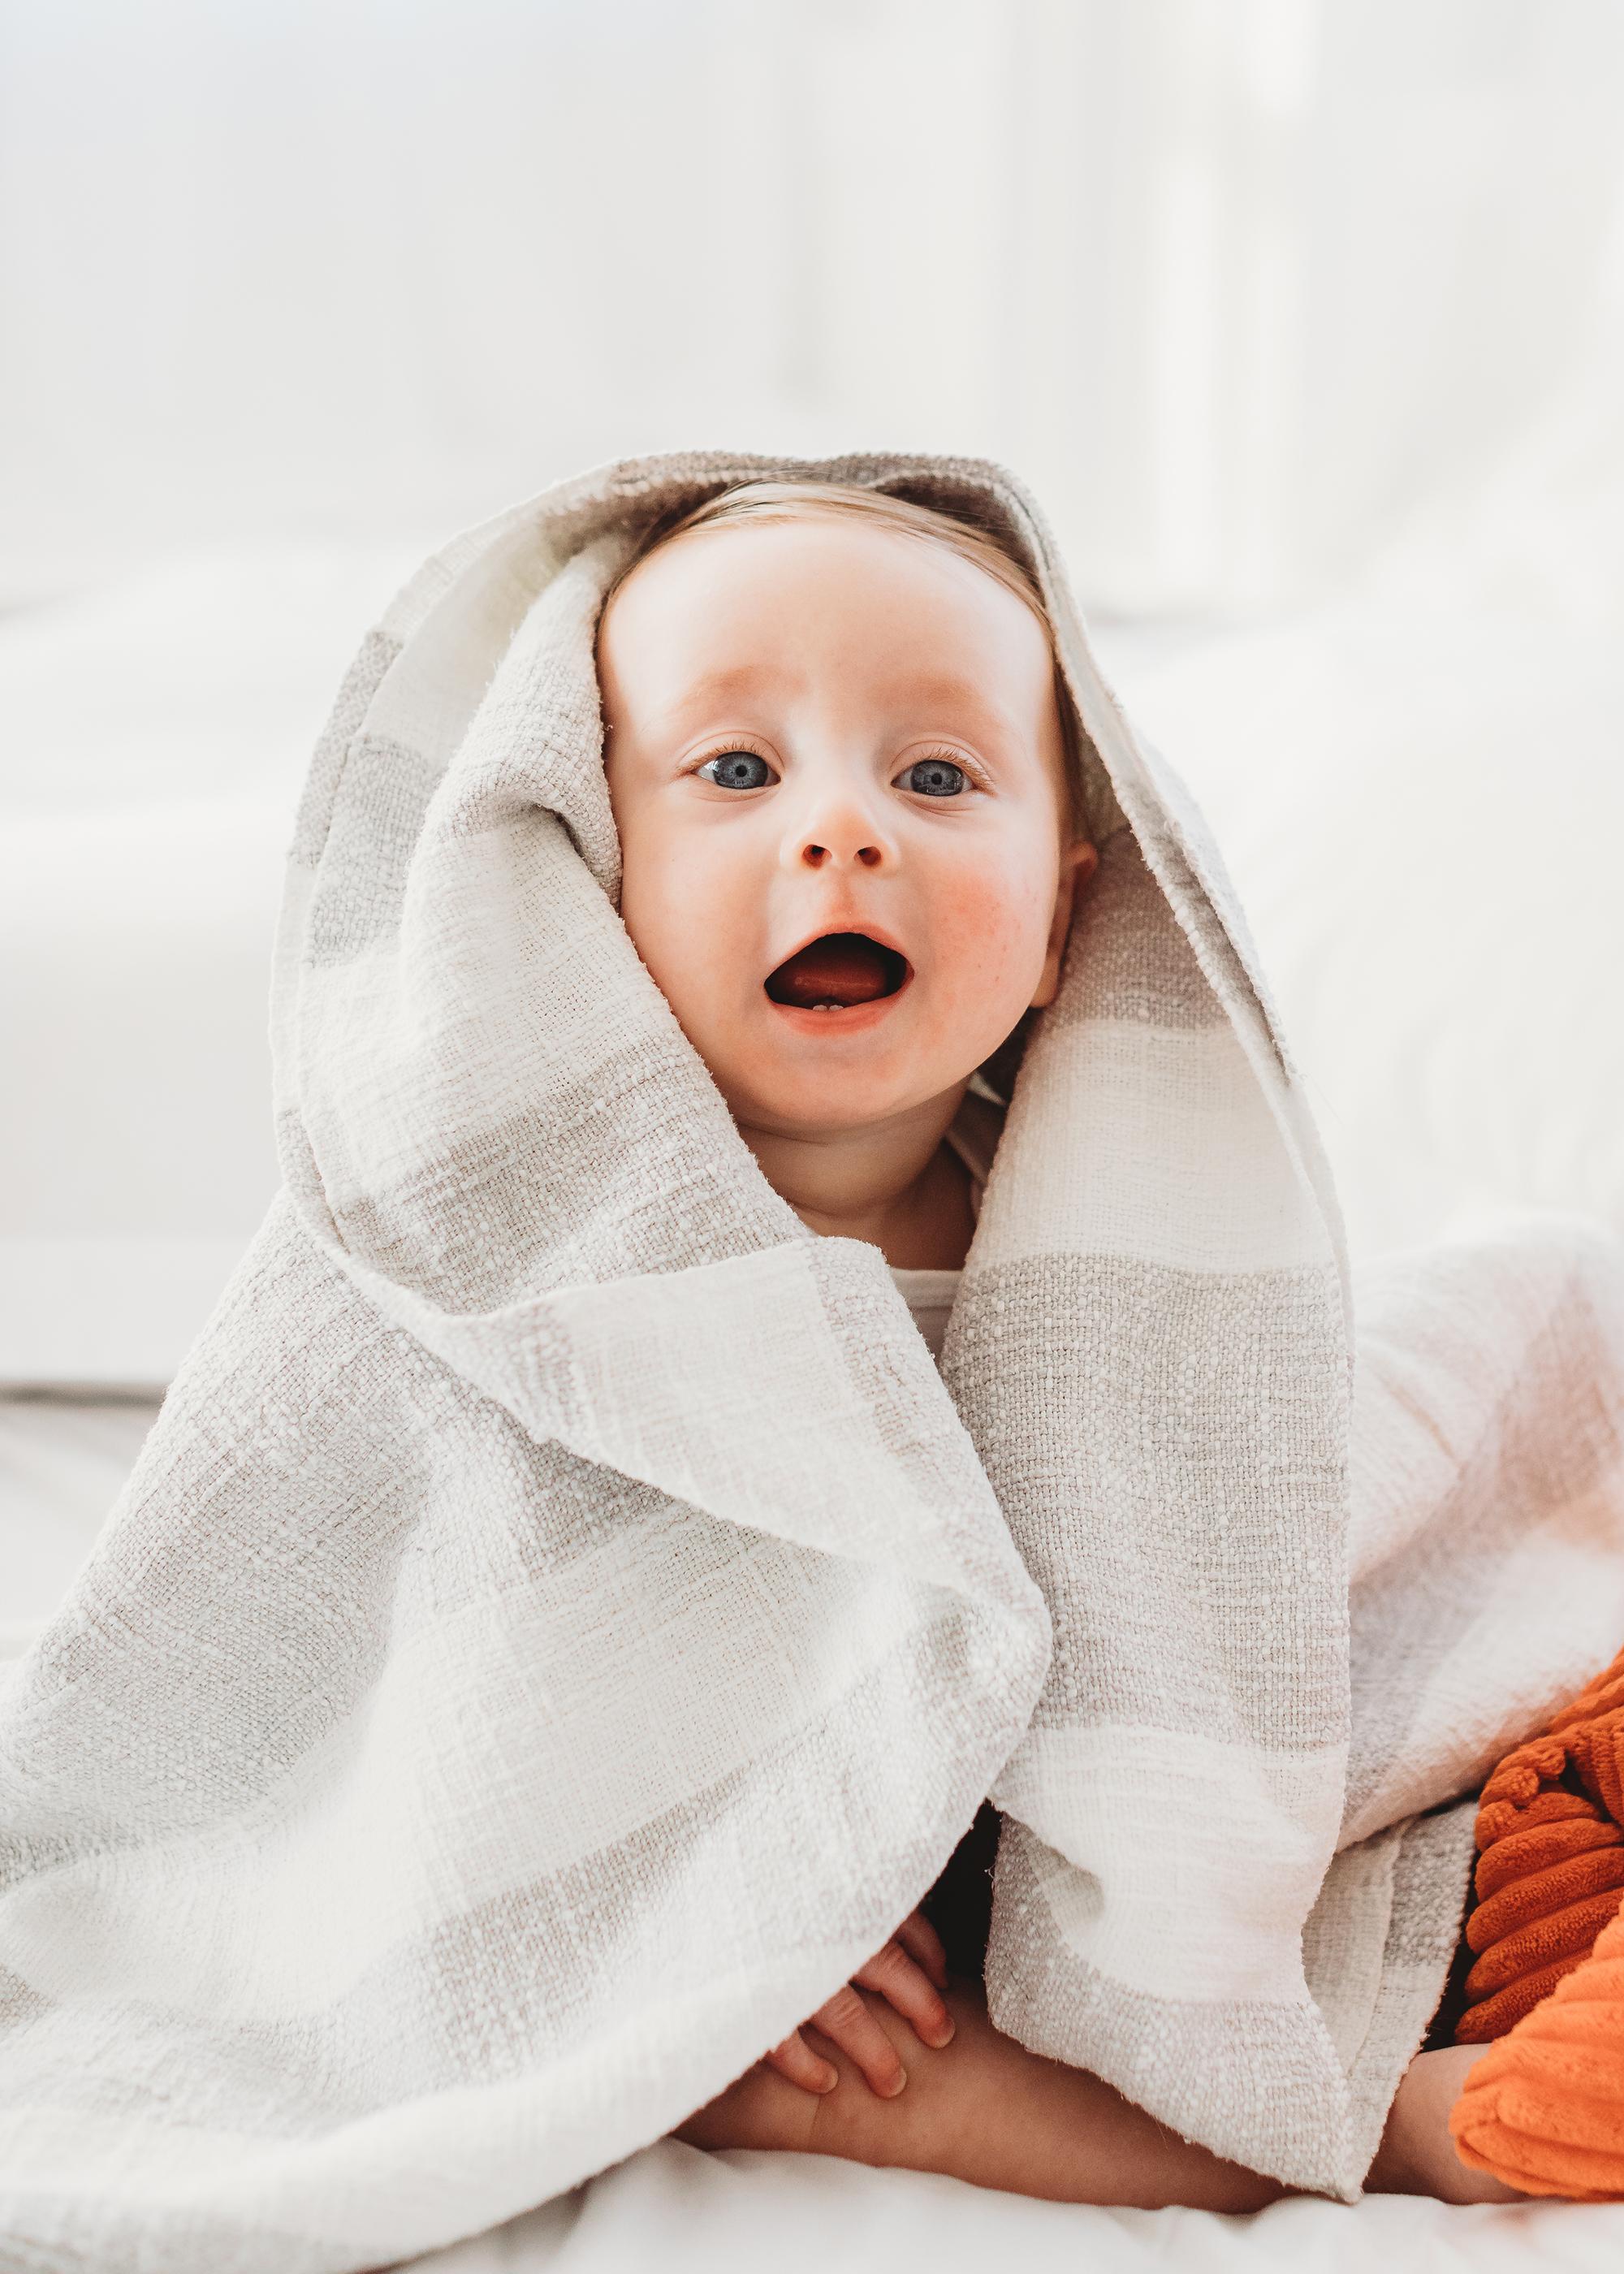 Toddler shenannegans! Boston toddler photography. First birthday photographer. Massachusetts family portraits.